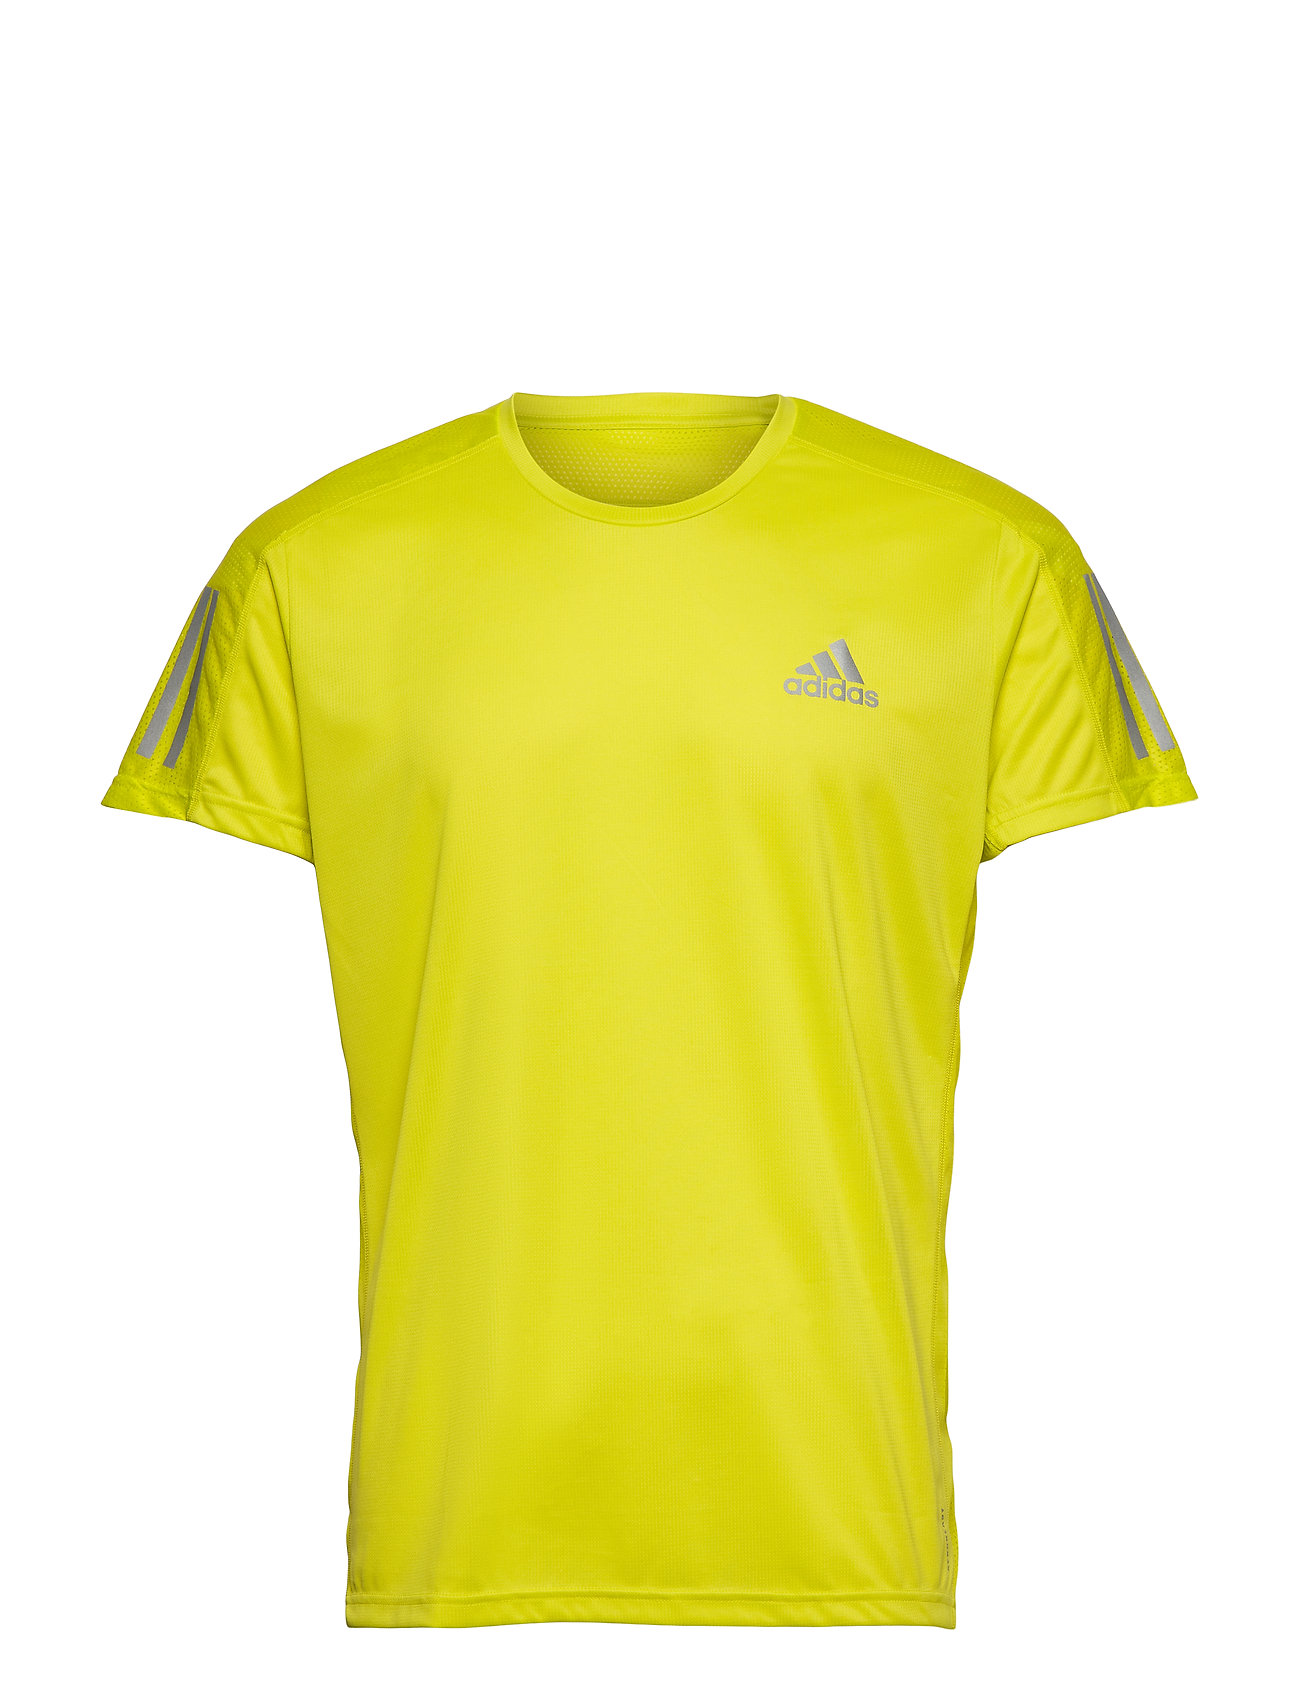 Image of Own The Run Tee T-shirt Gul Adidas Performance (3481596437)